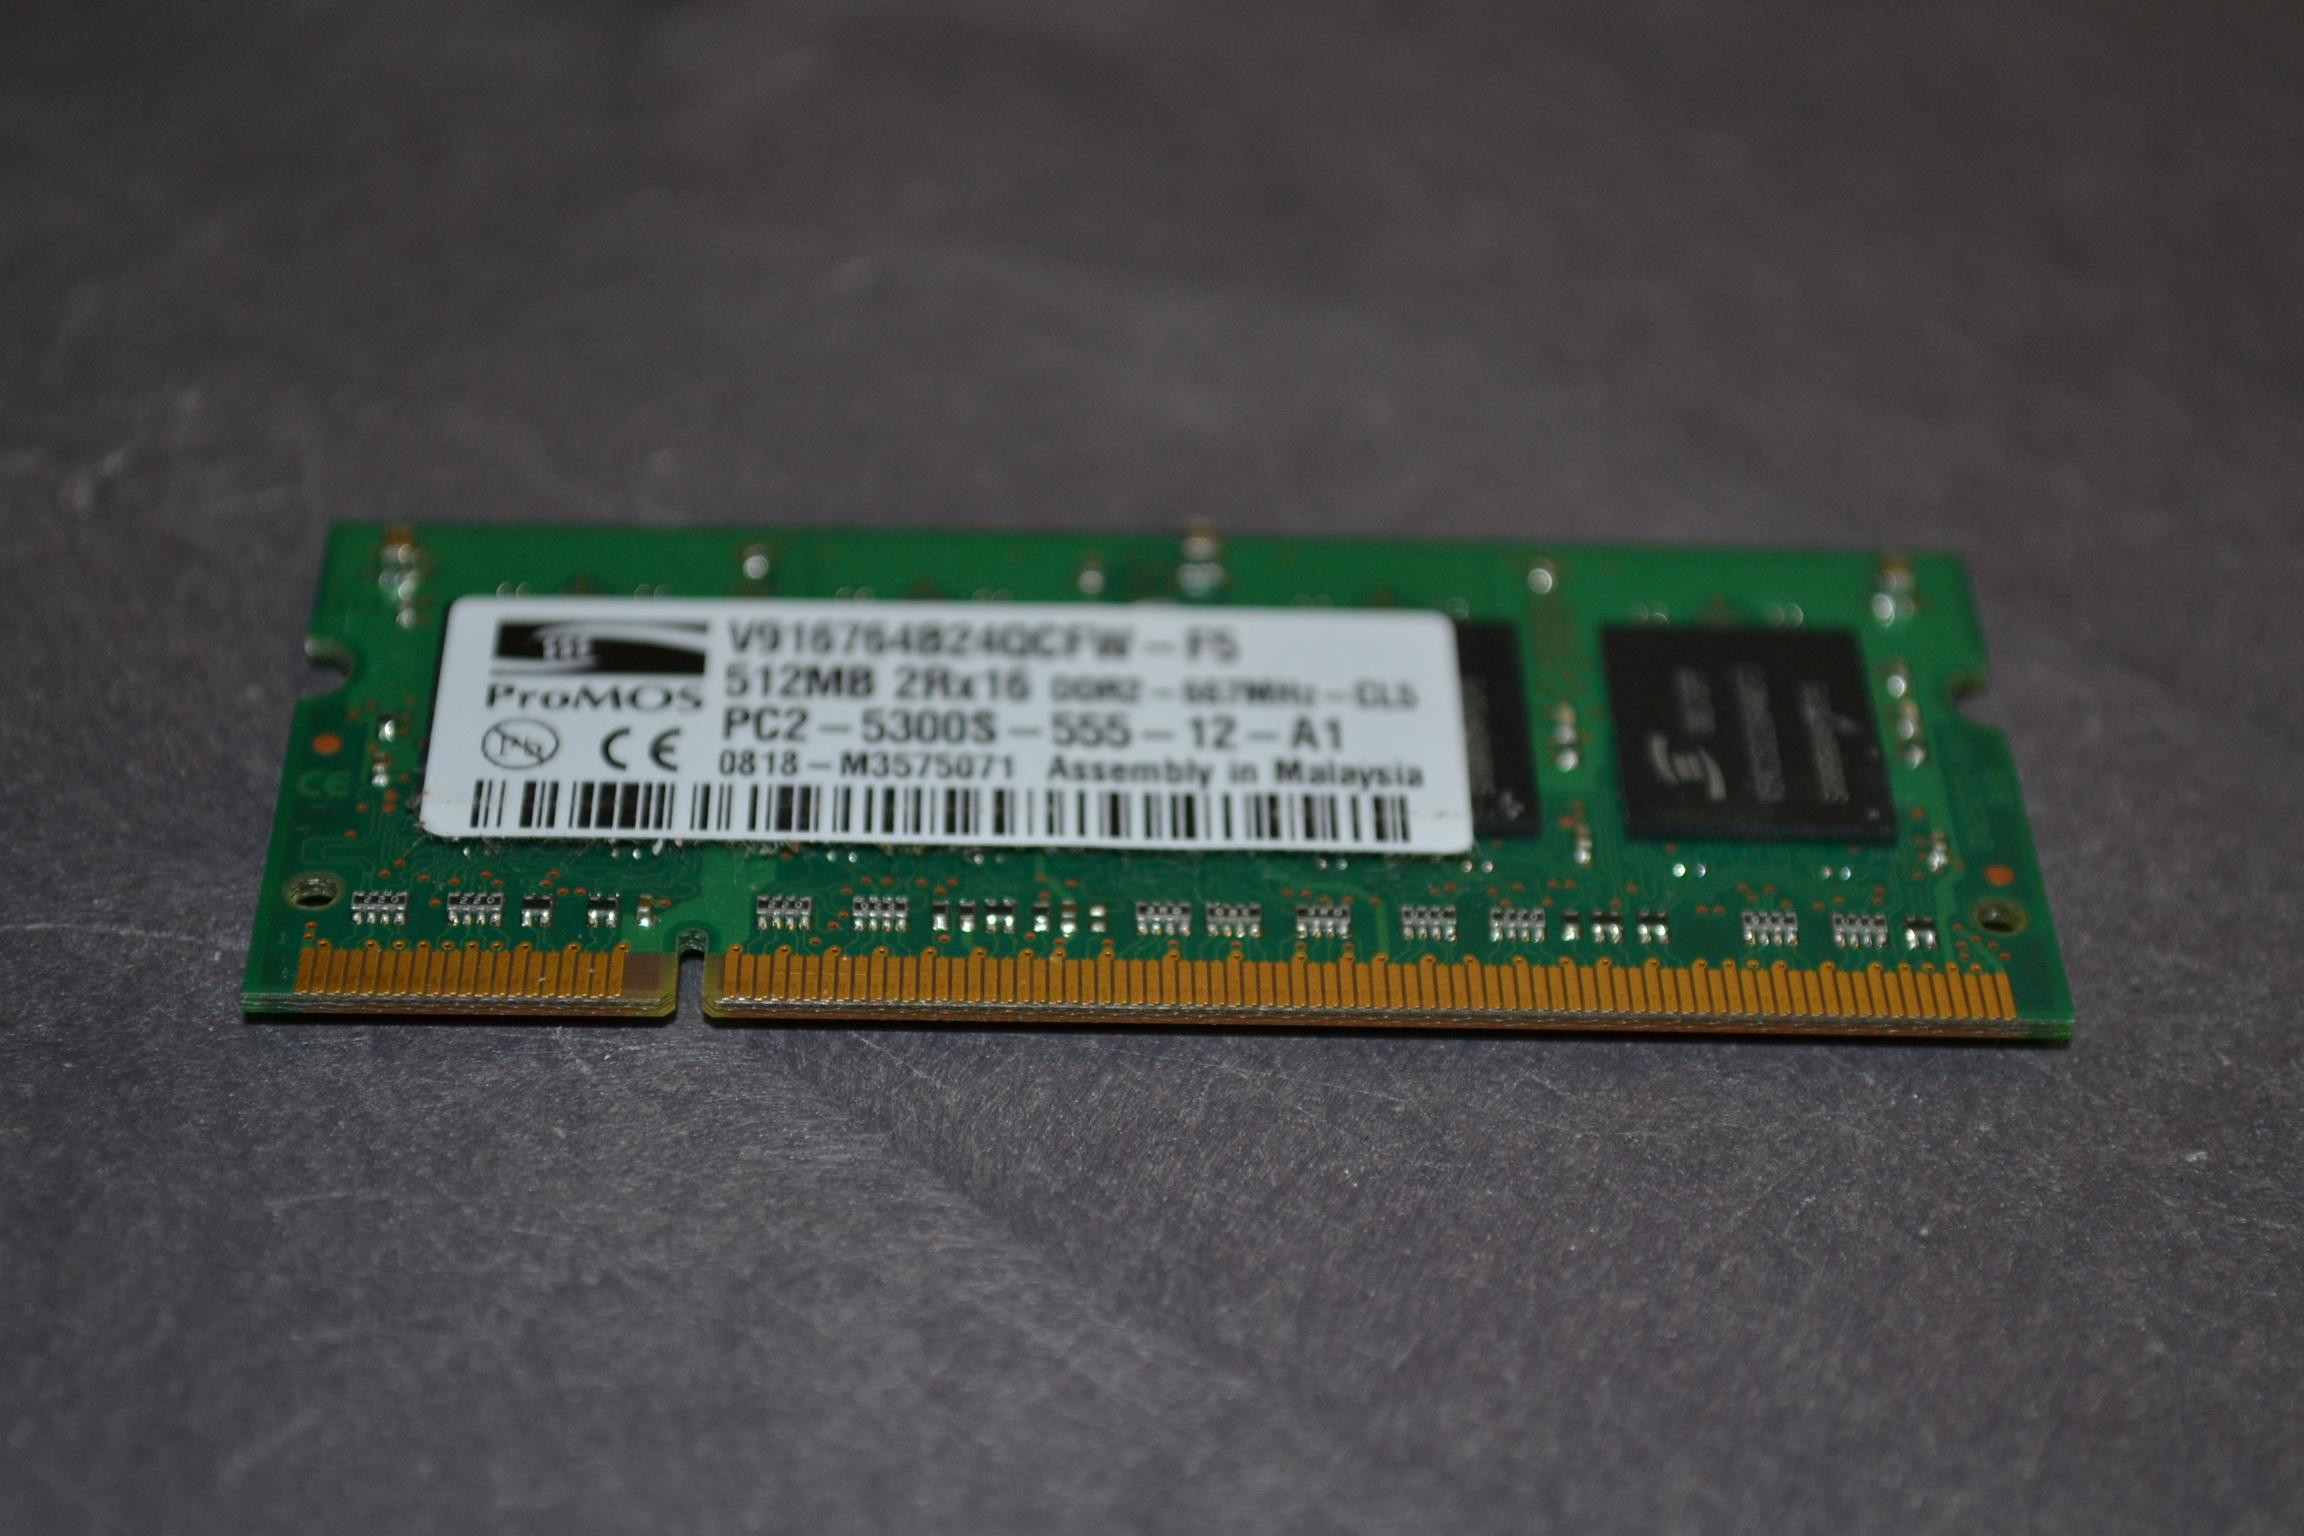 512MB DDR2 667MHZ PC2-5300S V916764B24QBFWF5